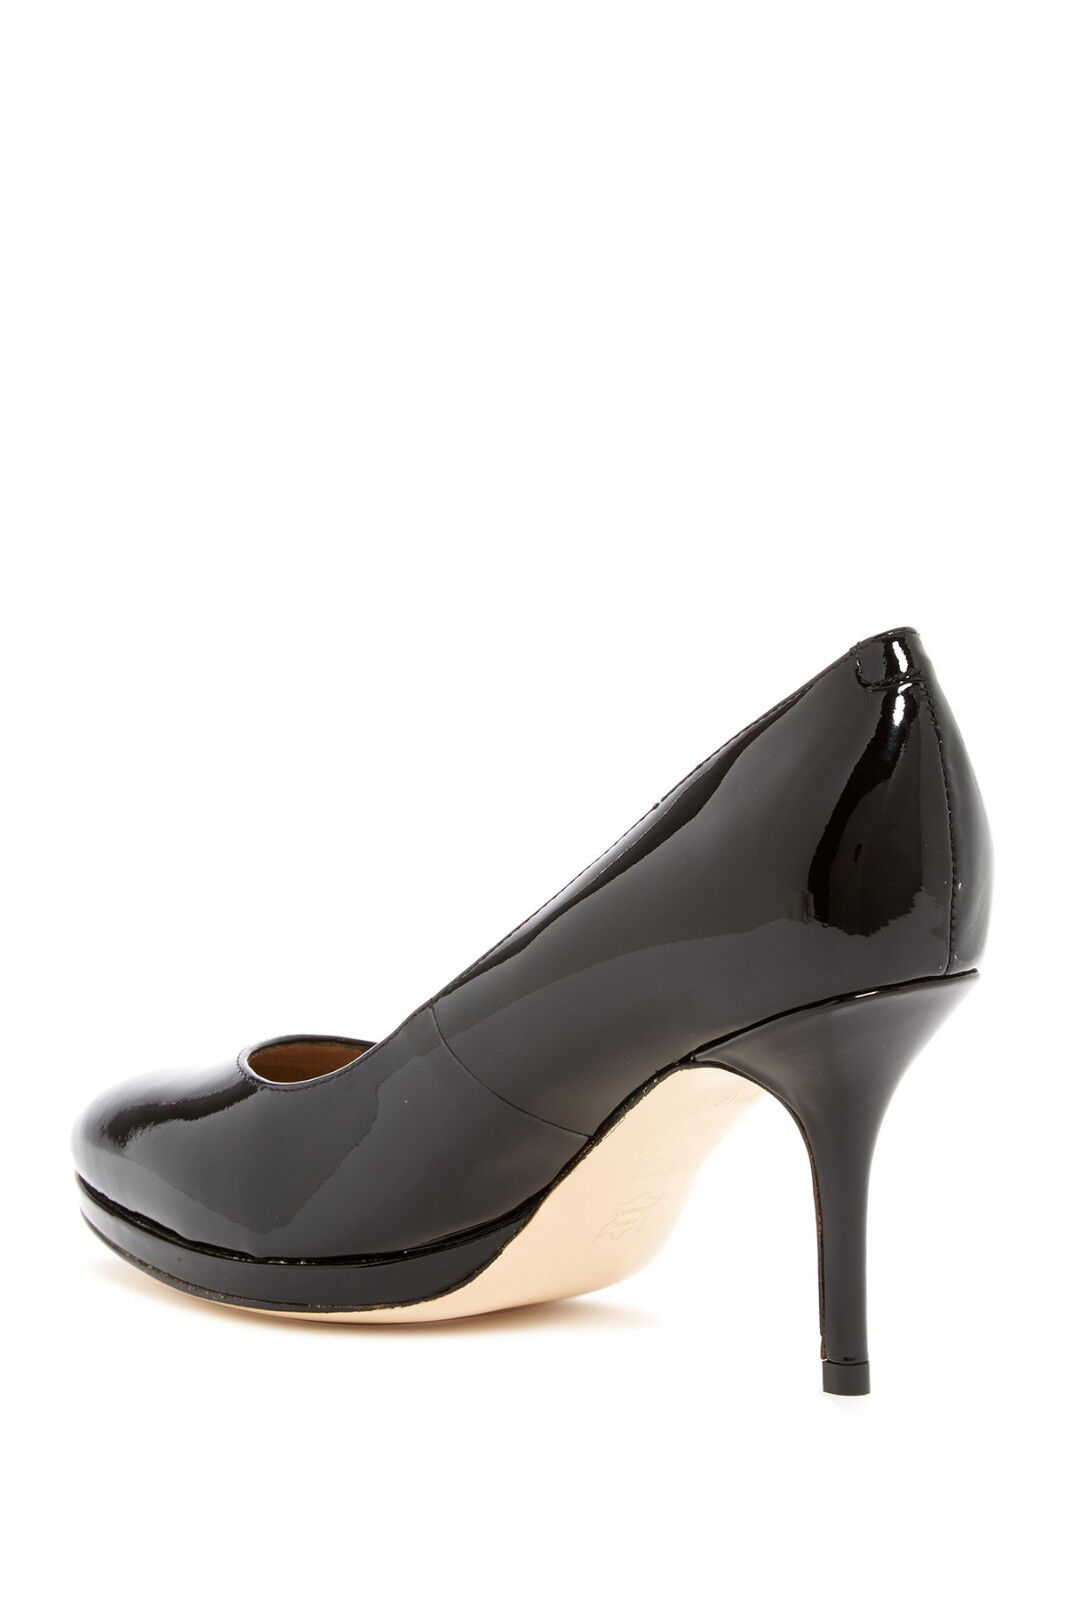 UKIES Paris Pump Women's shoe, Almond toe Open vamp, Slip-on Size 8.5B, $189 NWB